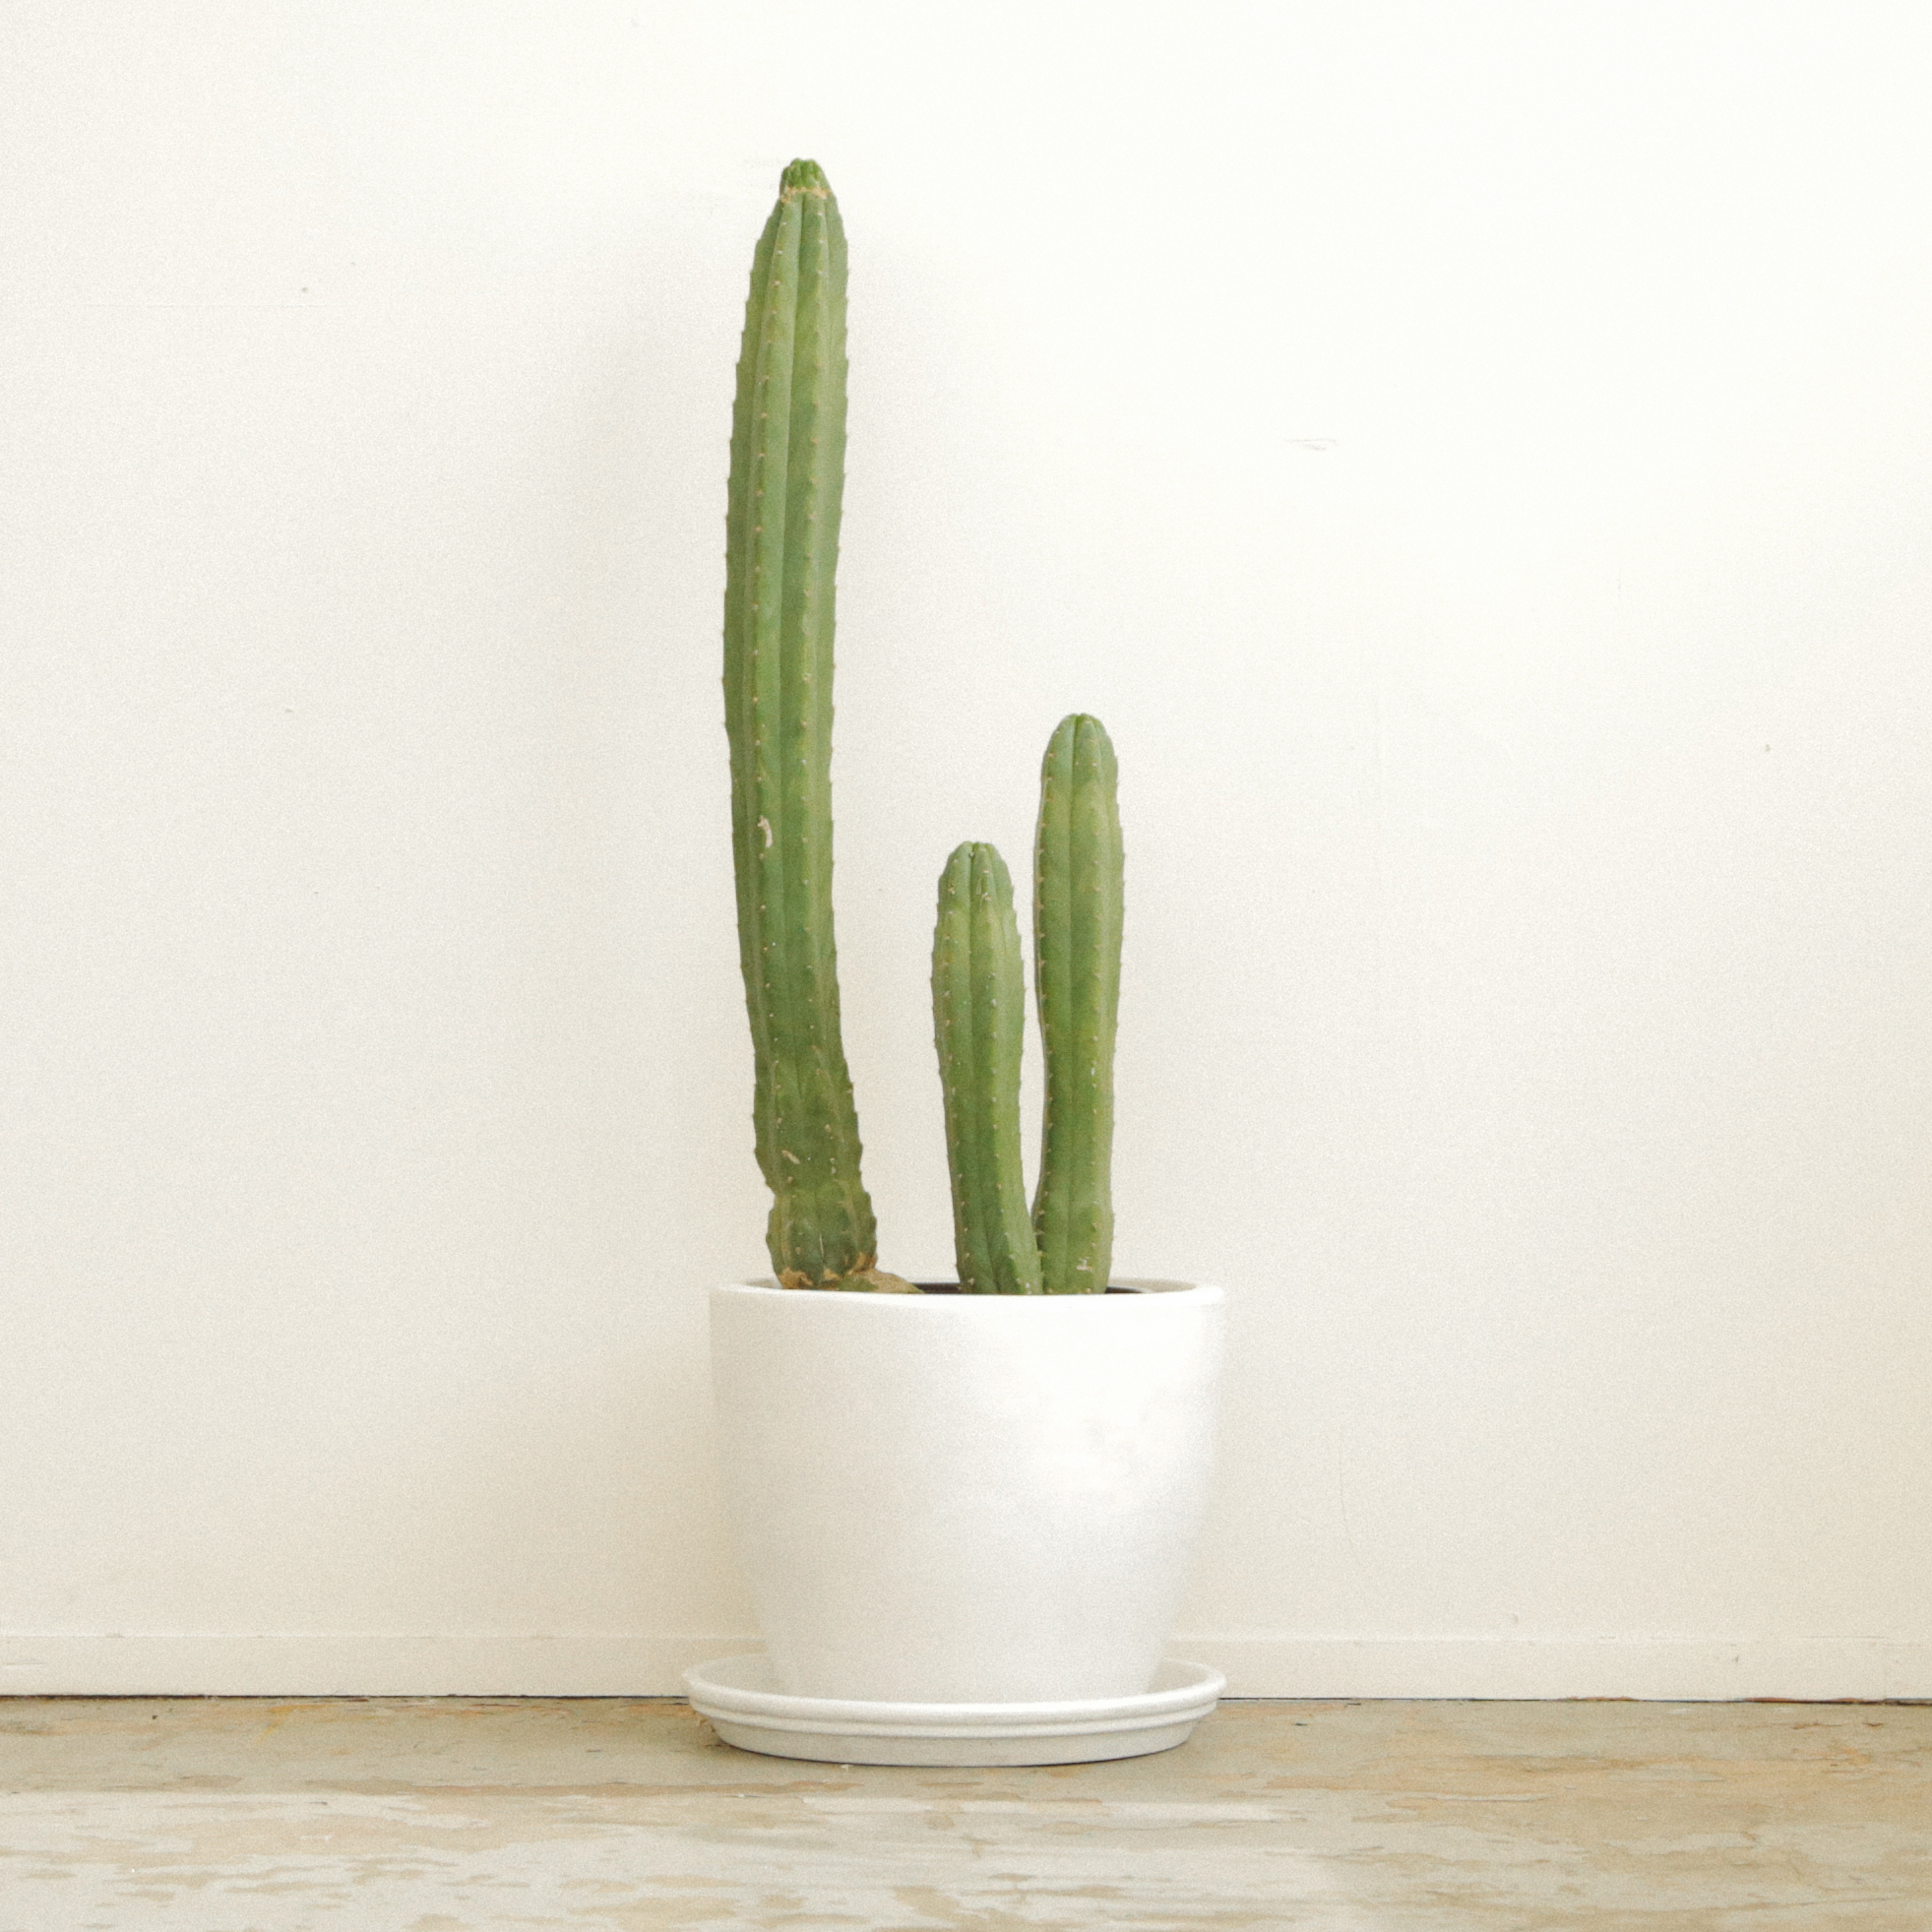 Ac - Other Cactus -